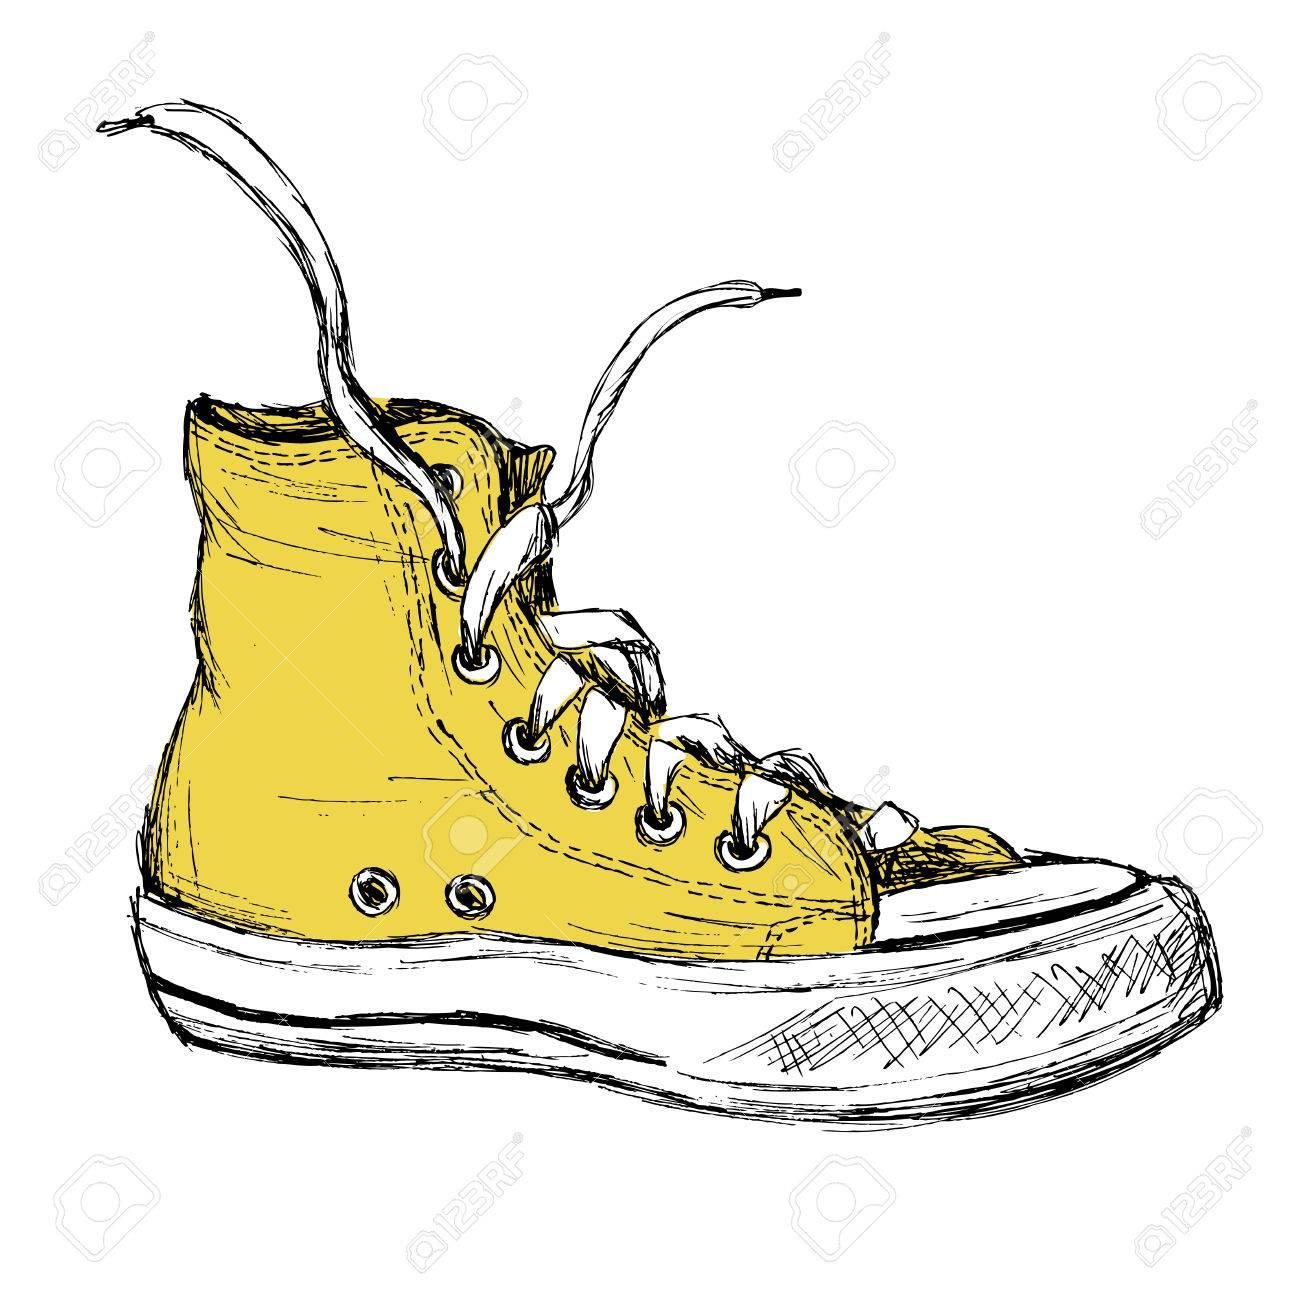 Fondo Sobre Blanco Zapatillas Dibujo Mano Deporte De Aisladas qxpP7